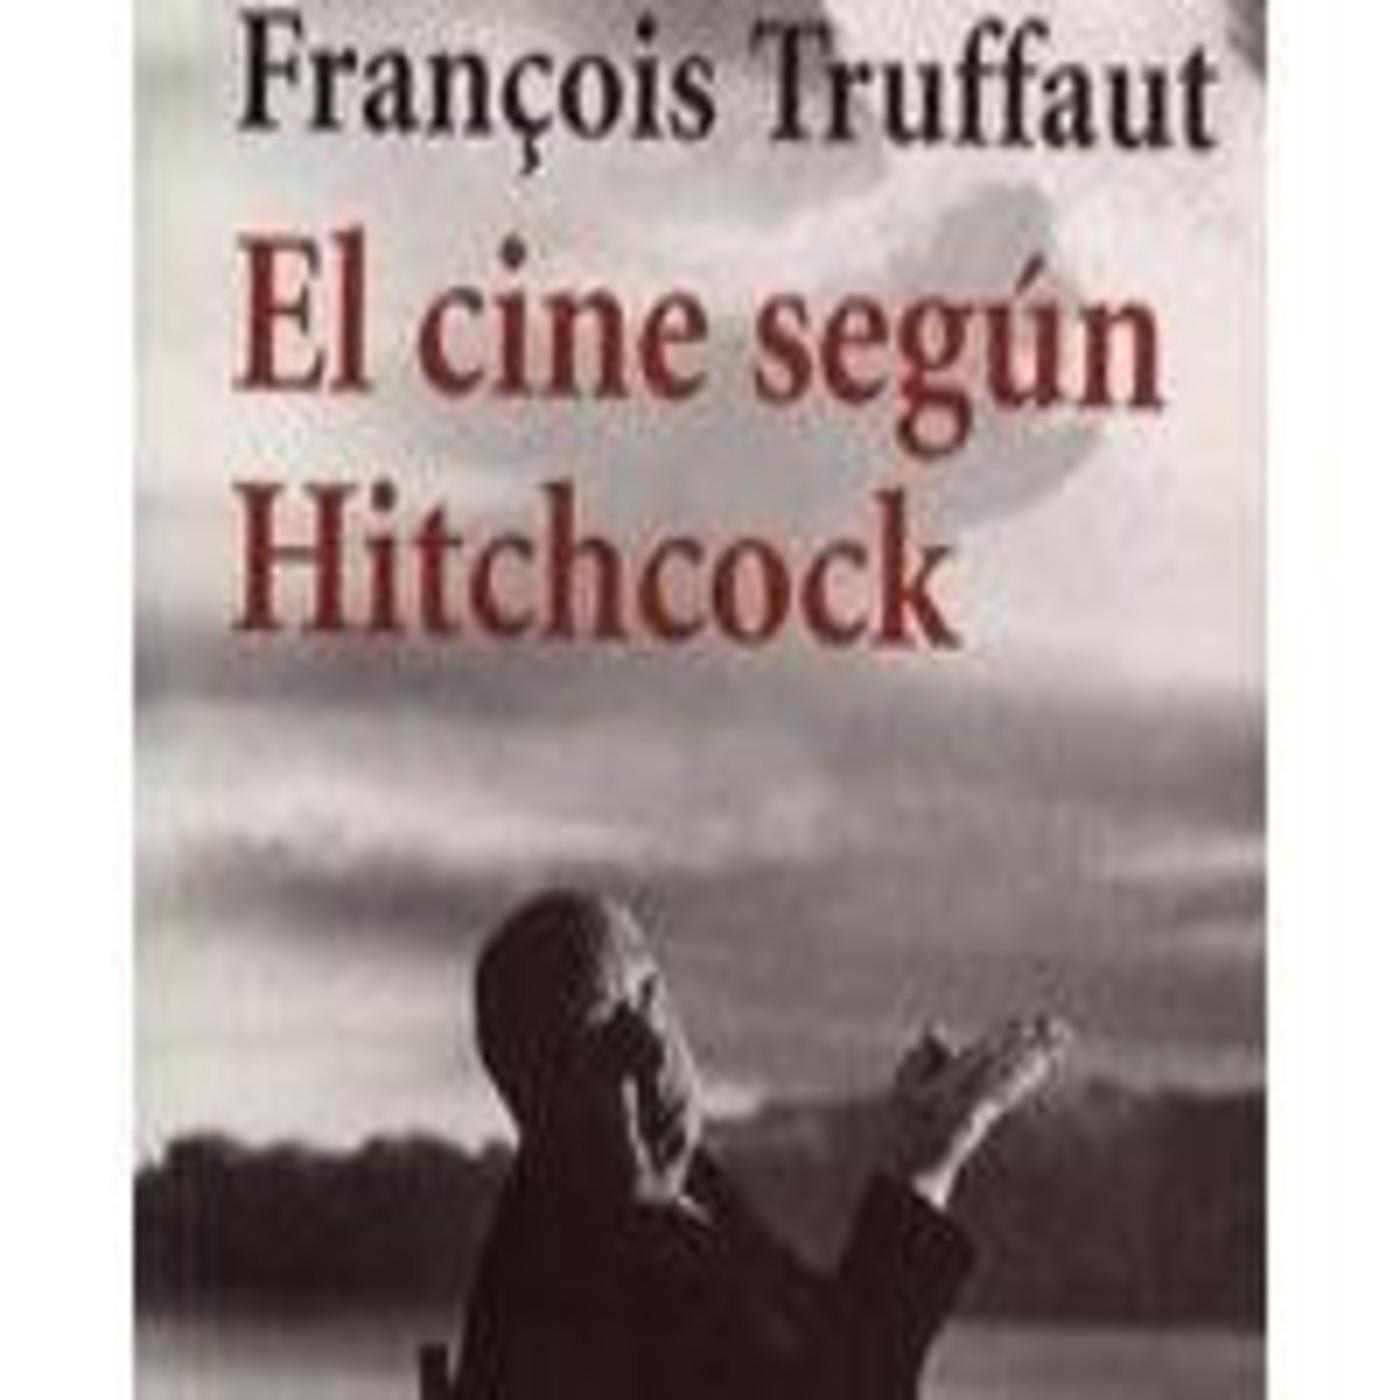 Videodrome - El cine según Hitchcock - 17/11/13